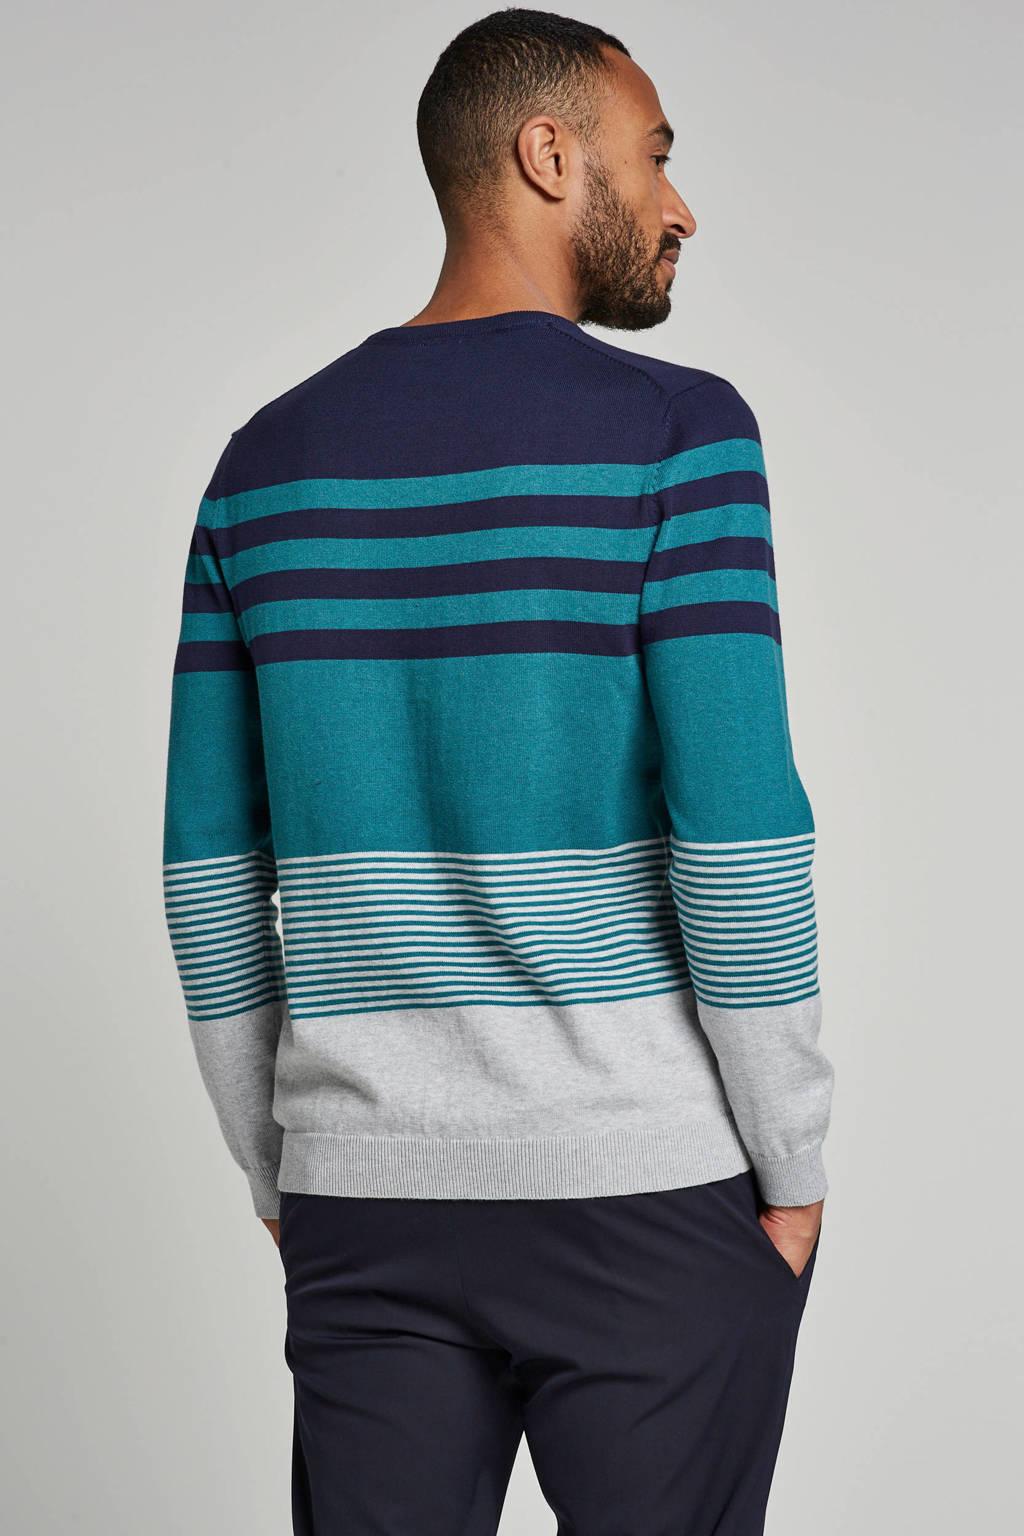 ESPRIT Men Casual trui, Groen/blauw